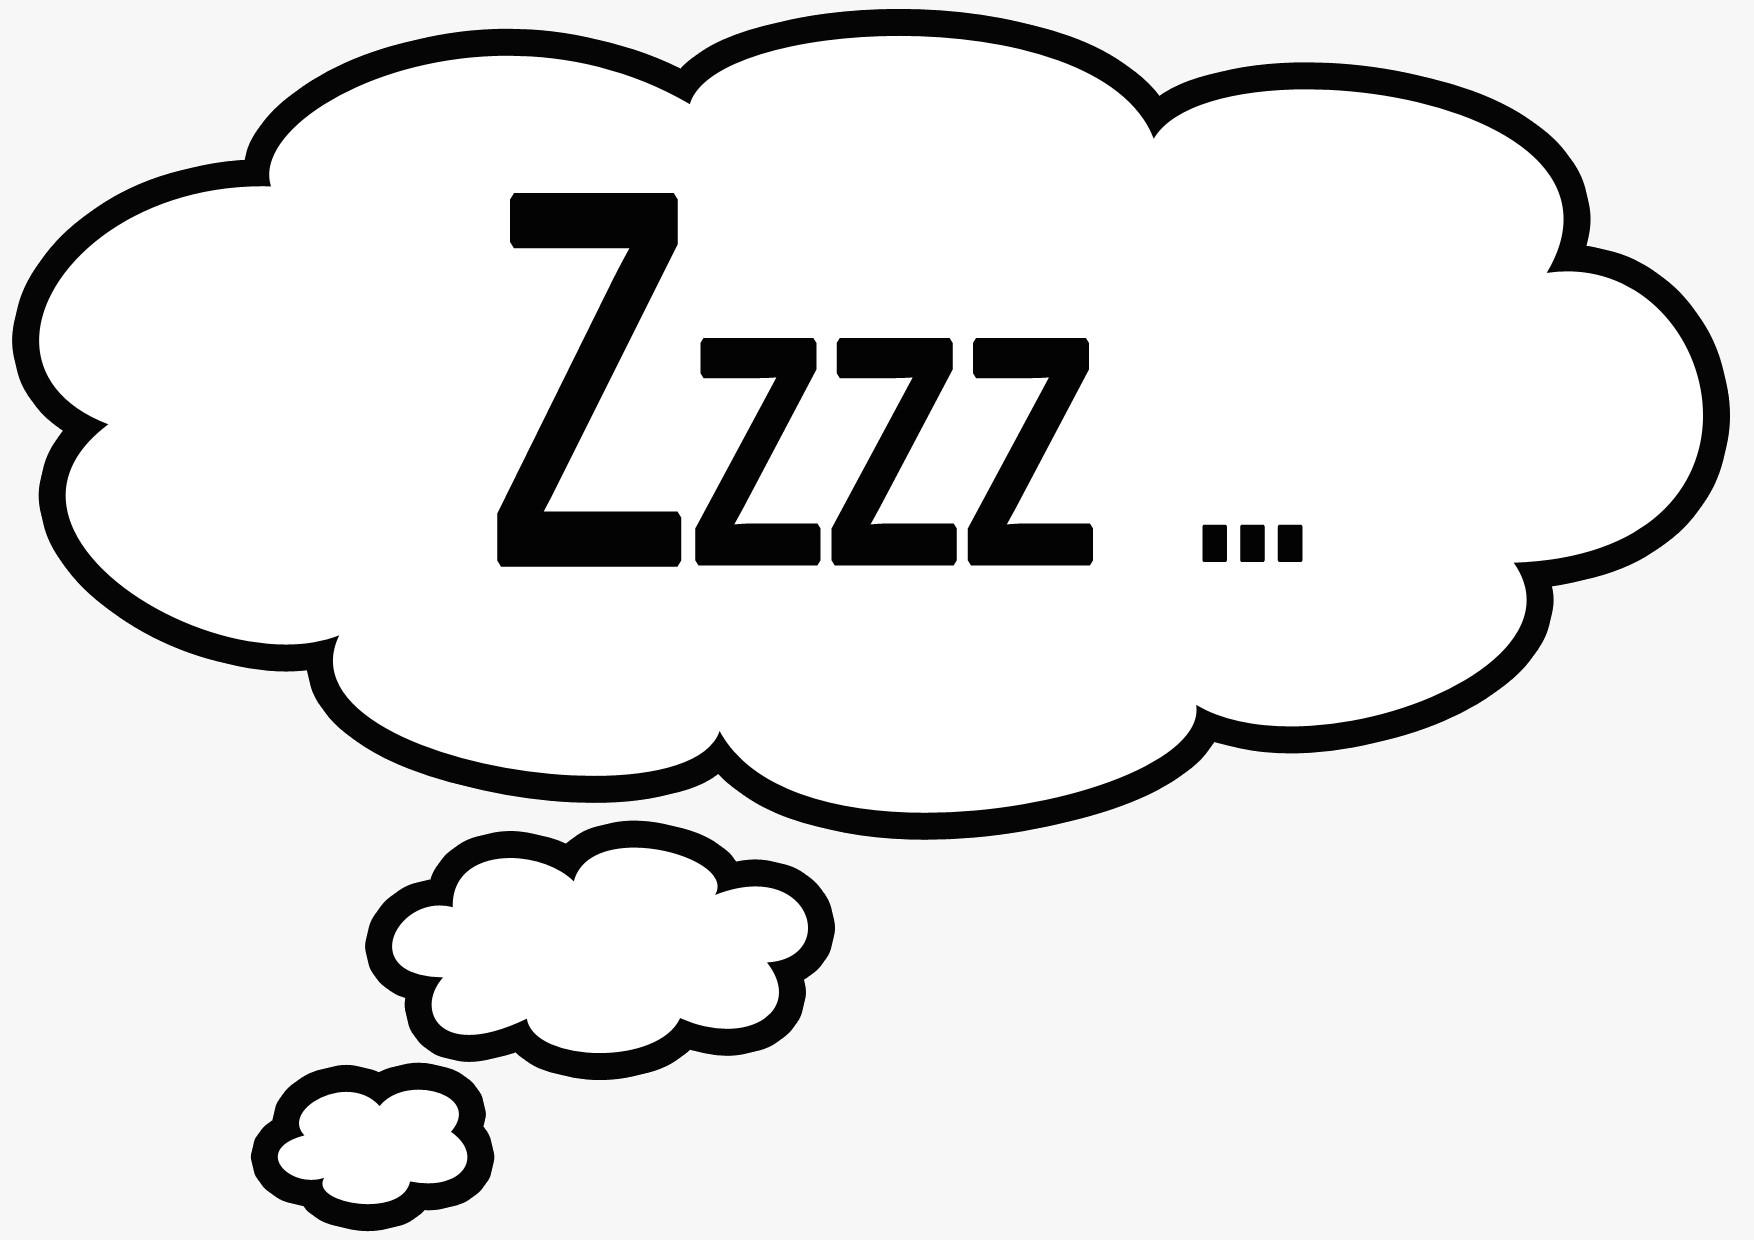 Sleeping Cartoon Zzz Naiqkh Clipart On Psychology And